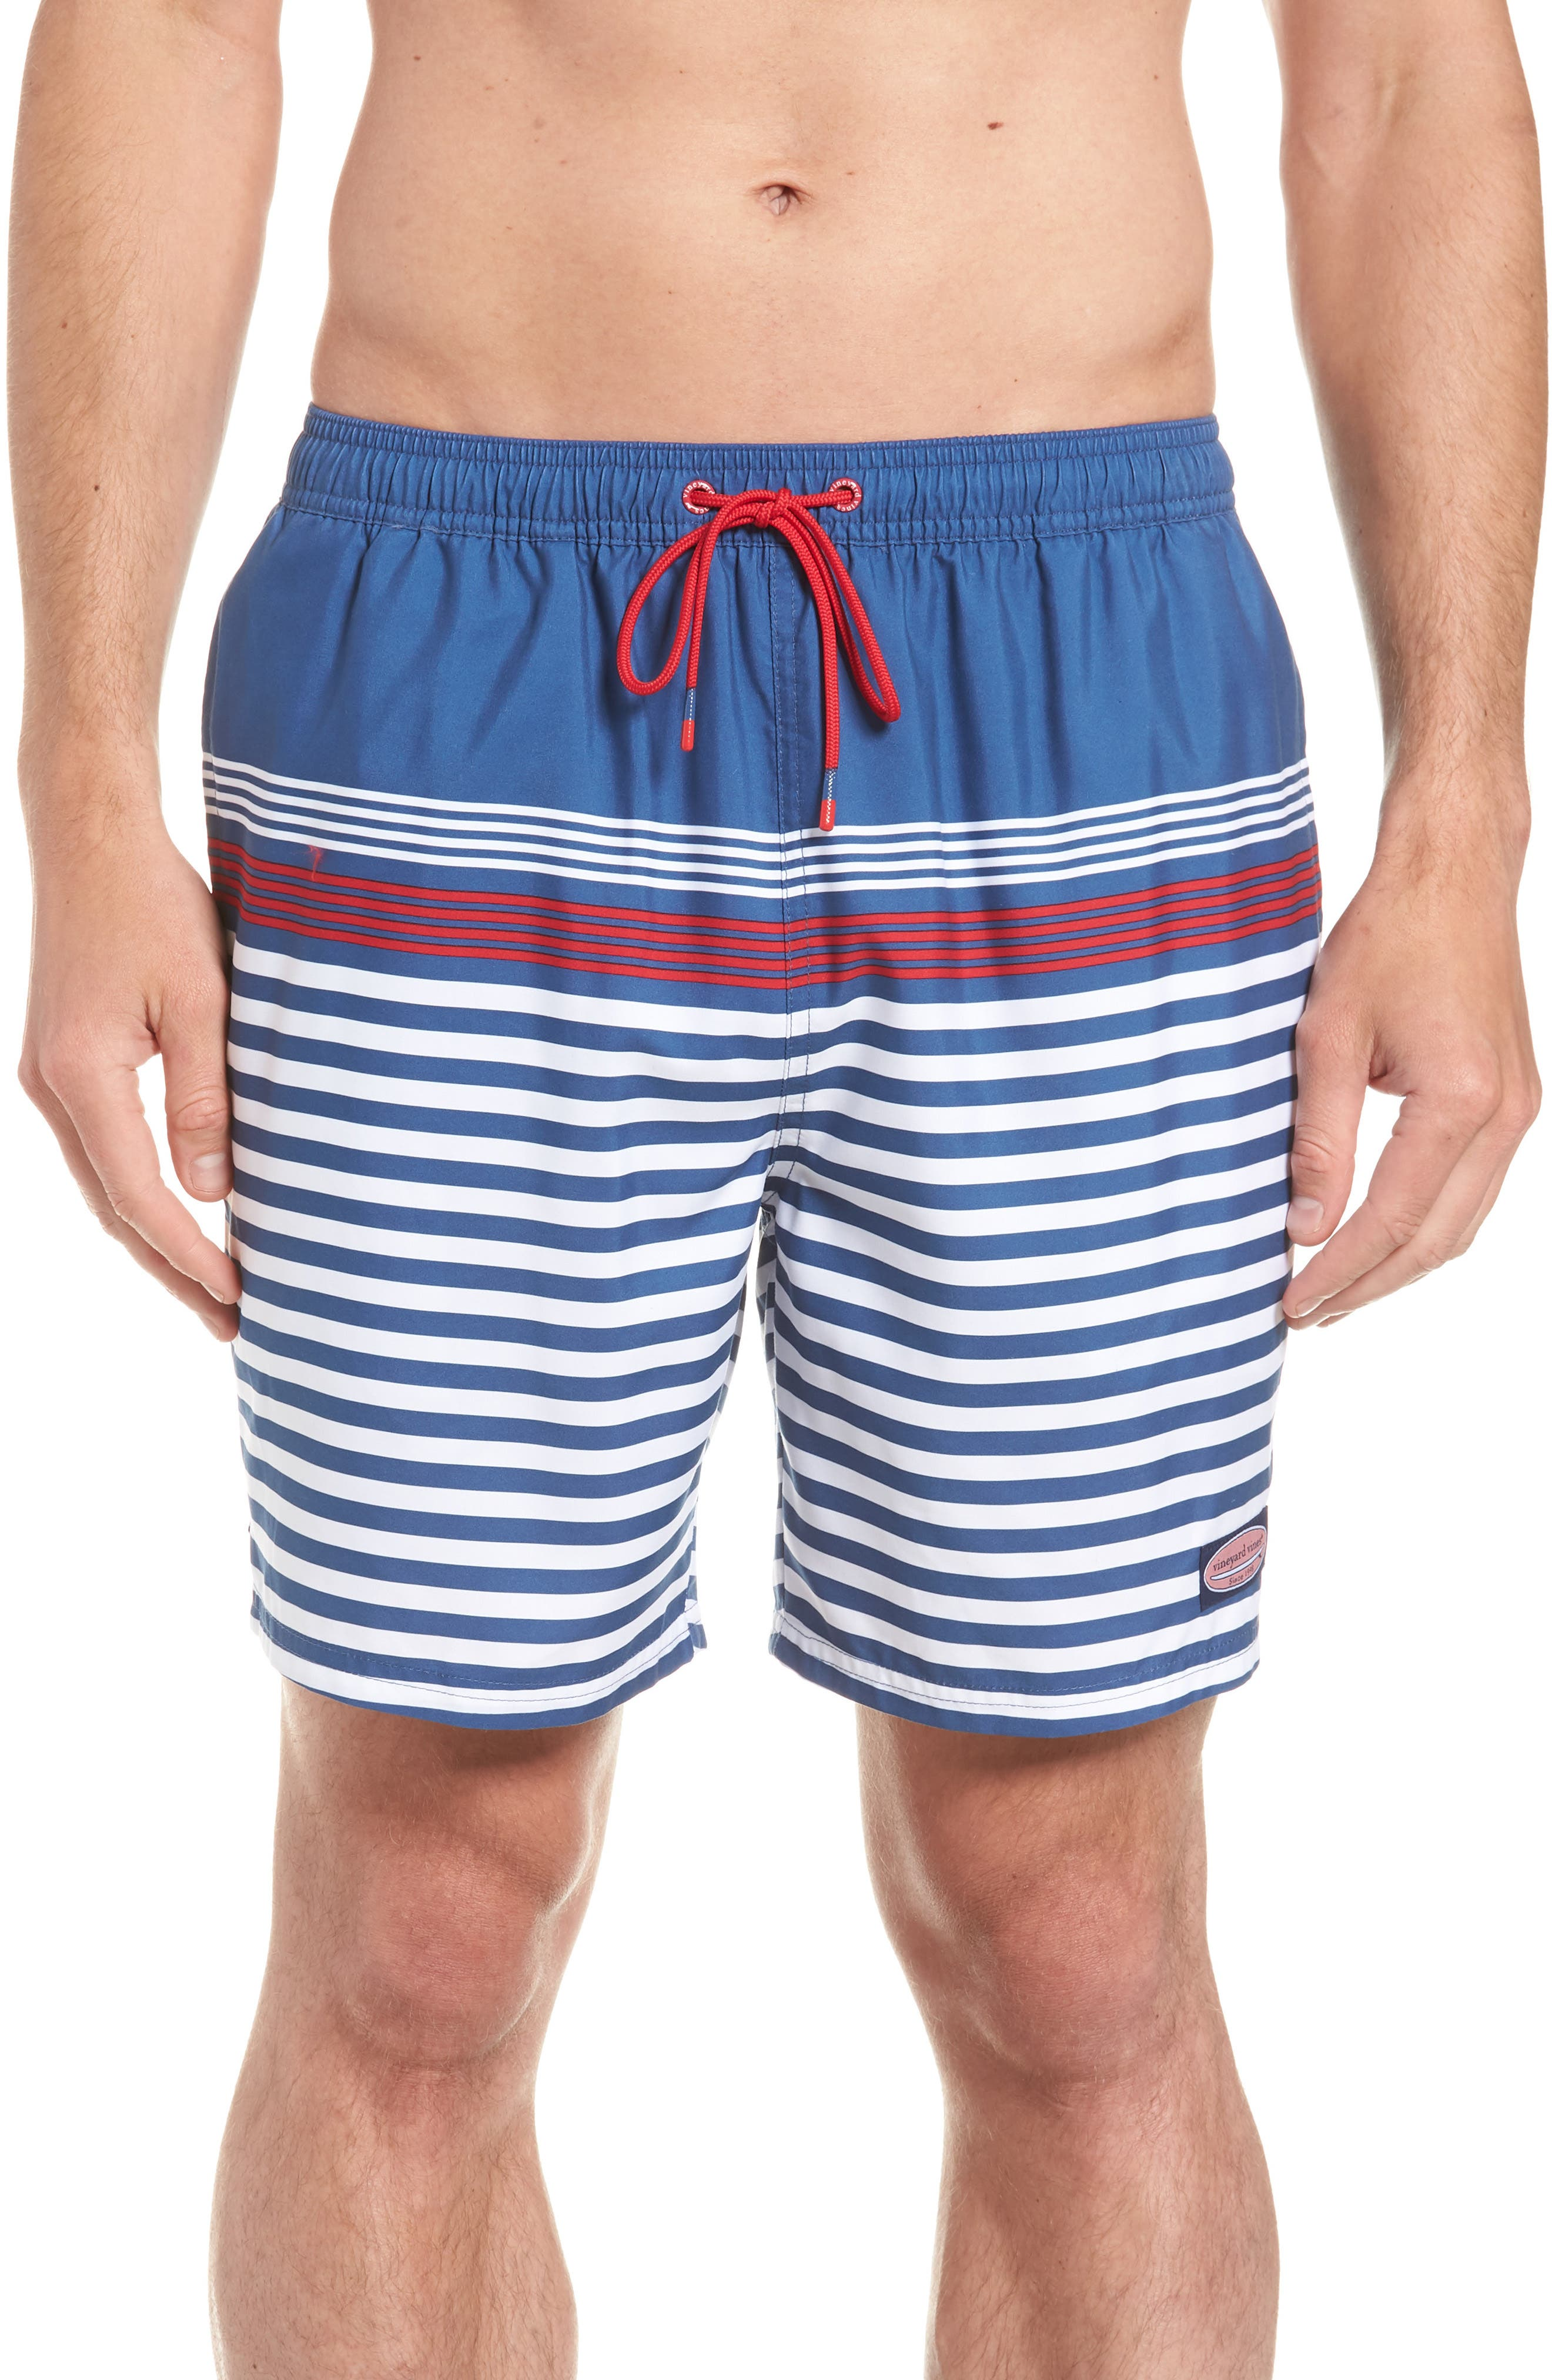 Chappy Summerall Stripe Swim Trunks,                         Main,                         color, 461